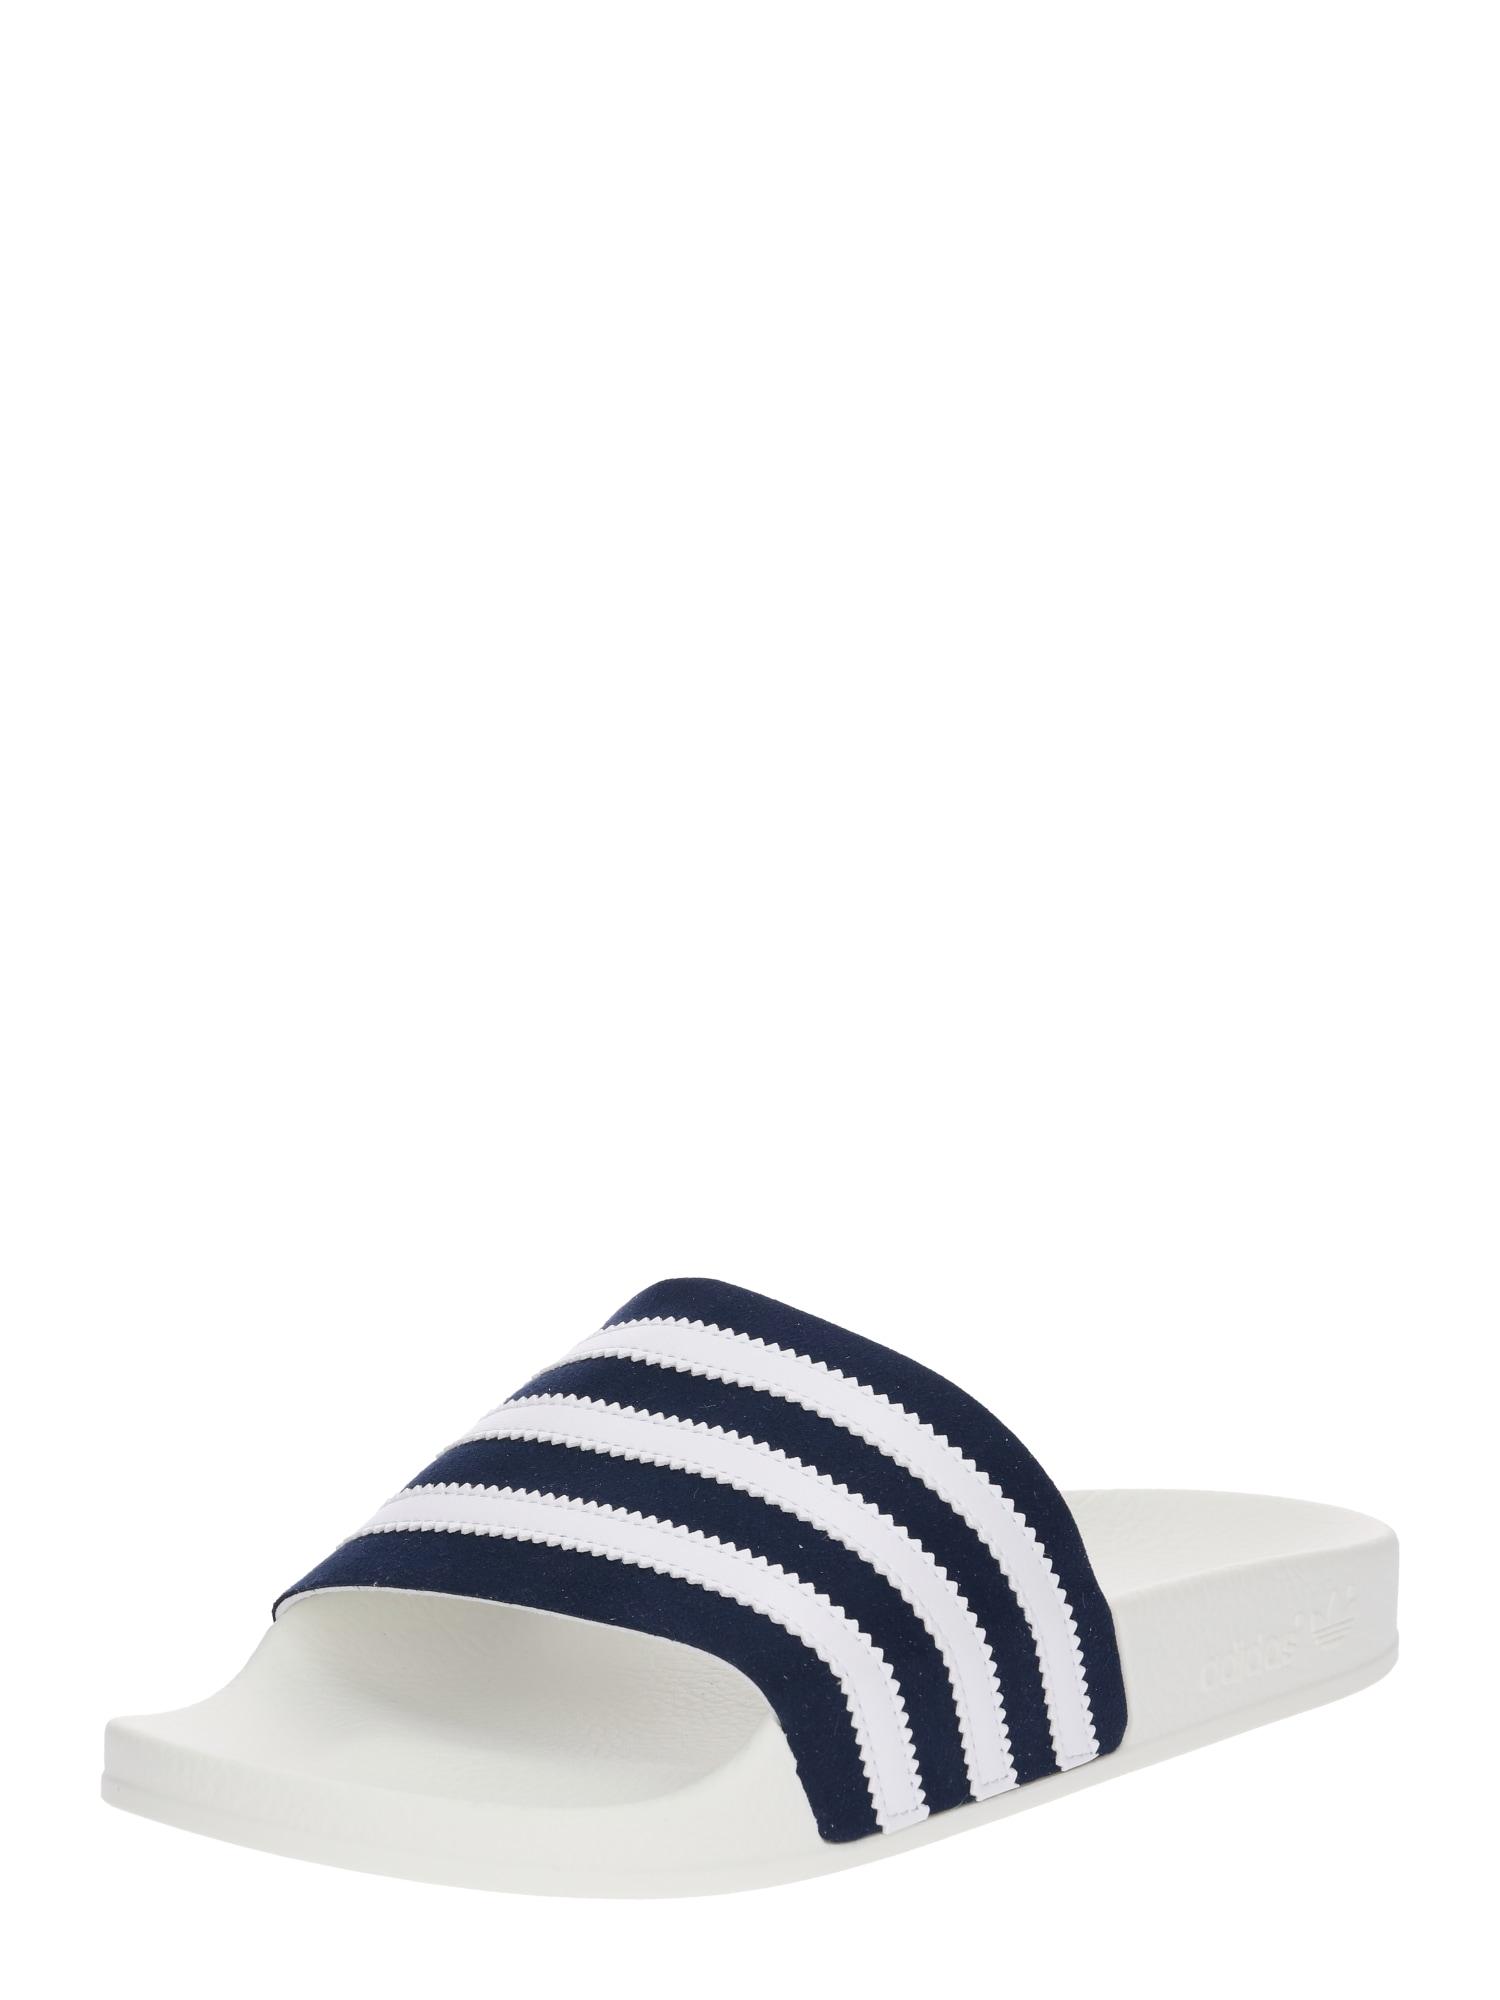 Pantofle Adilette námořnická modř bílá ADIDAS ORIGINALS